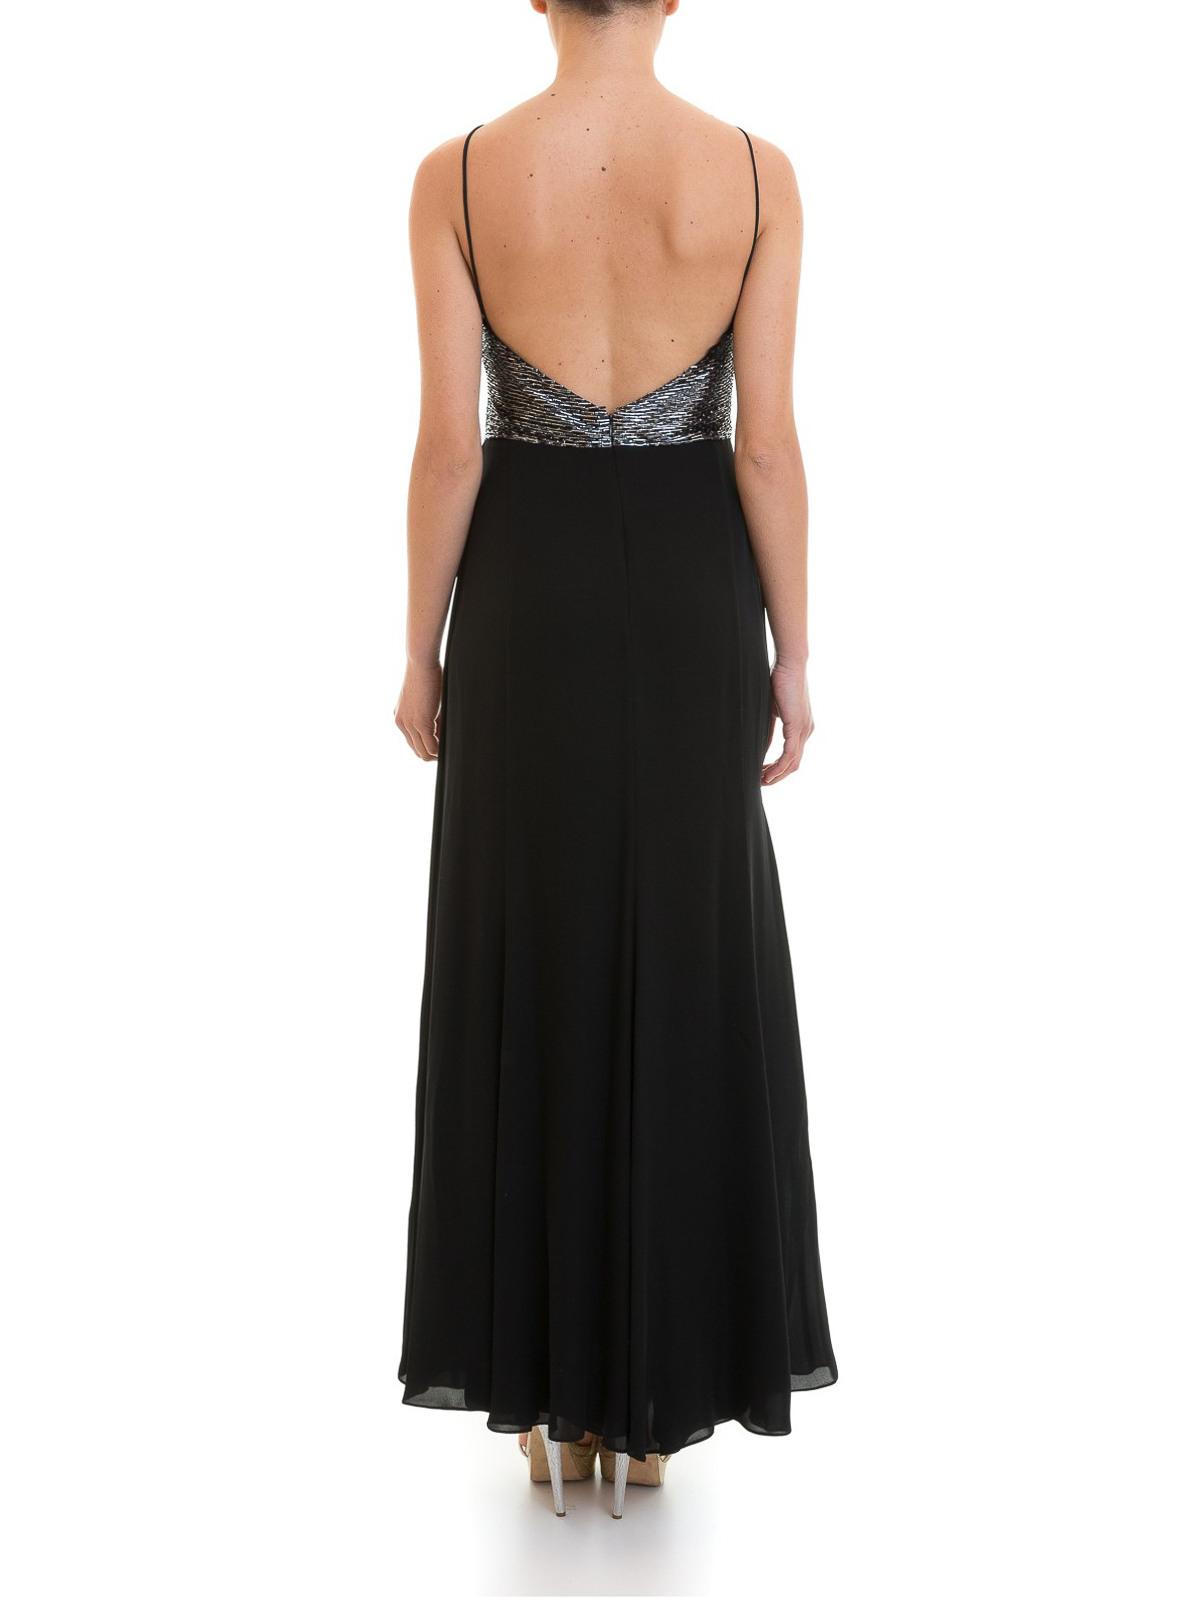 13 Luxurius Armani Abendkleid Bester Preis Spektakulär Armani Abendkleid für 2019